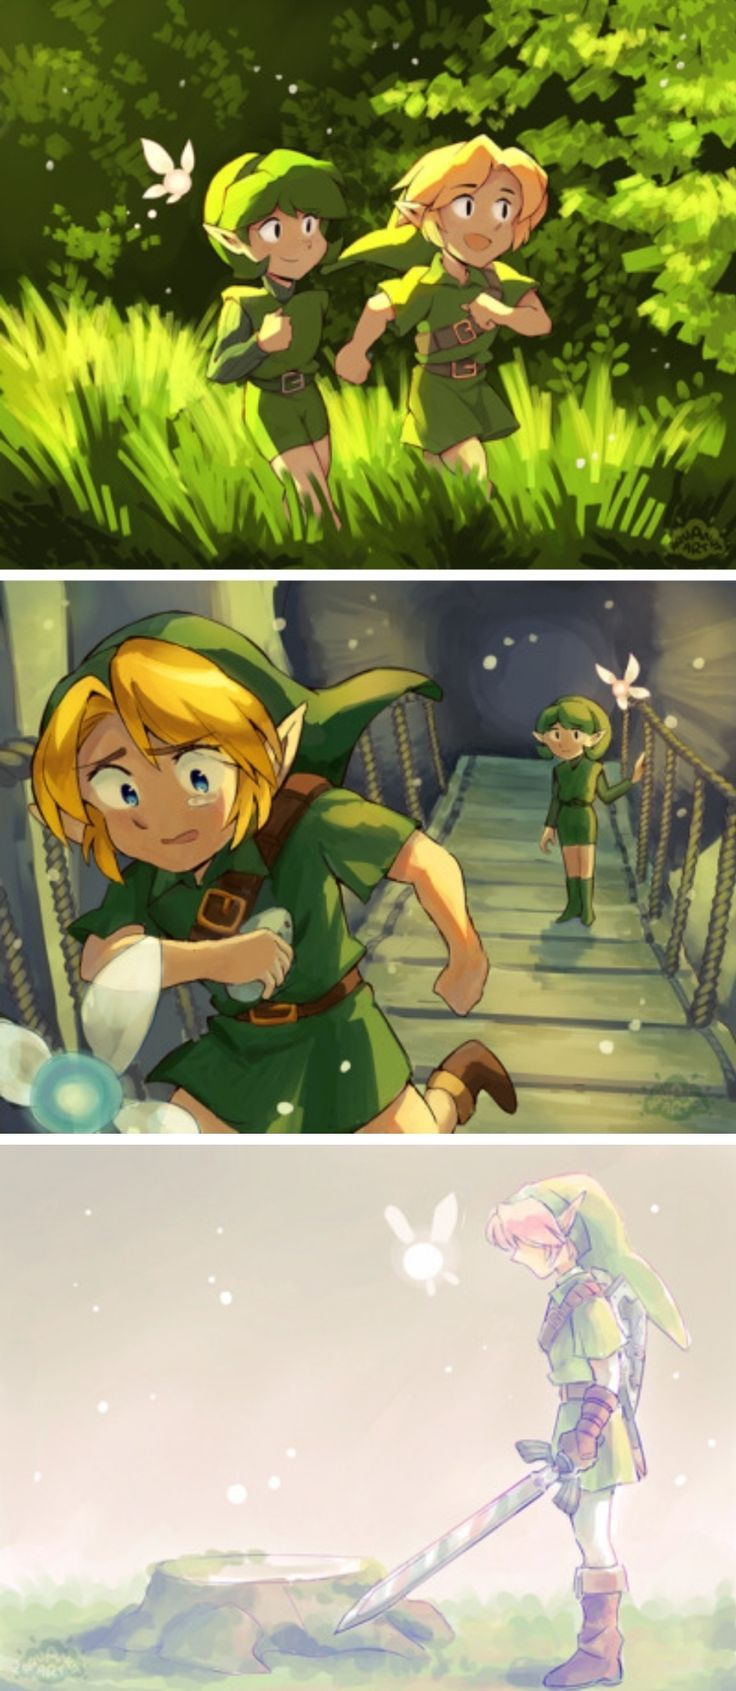 Calm Saturday Visit Blazezelda Tumblr Legend Of Zelda Midna Legend Of Zelda Memes Legend Of Zelda